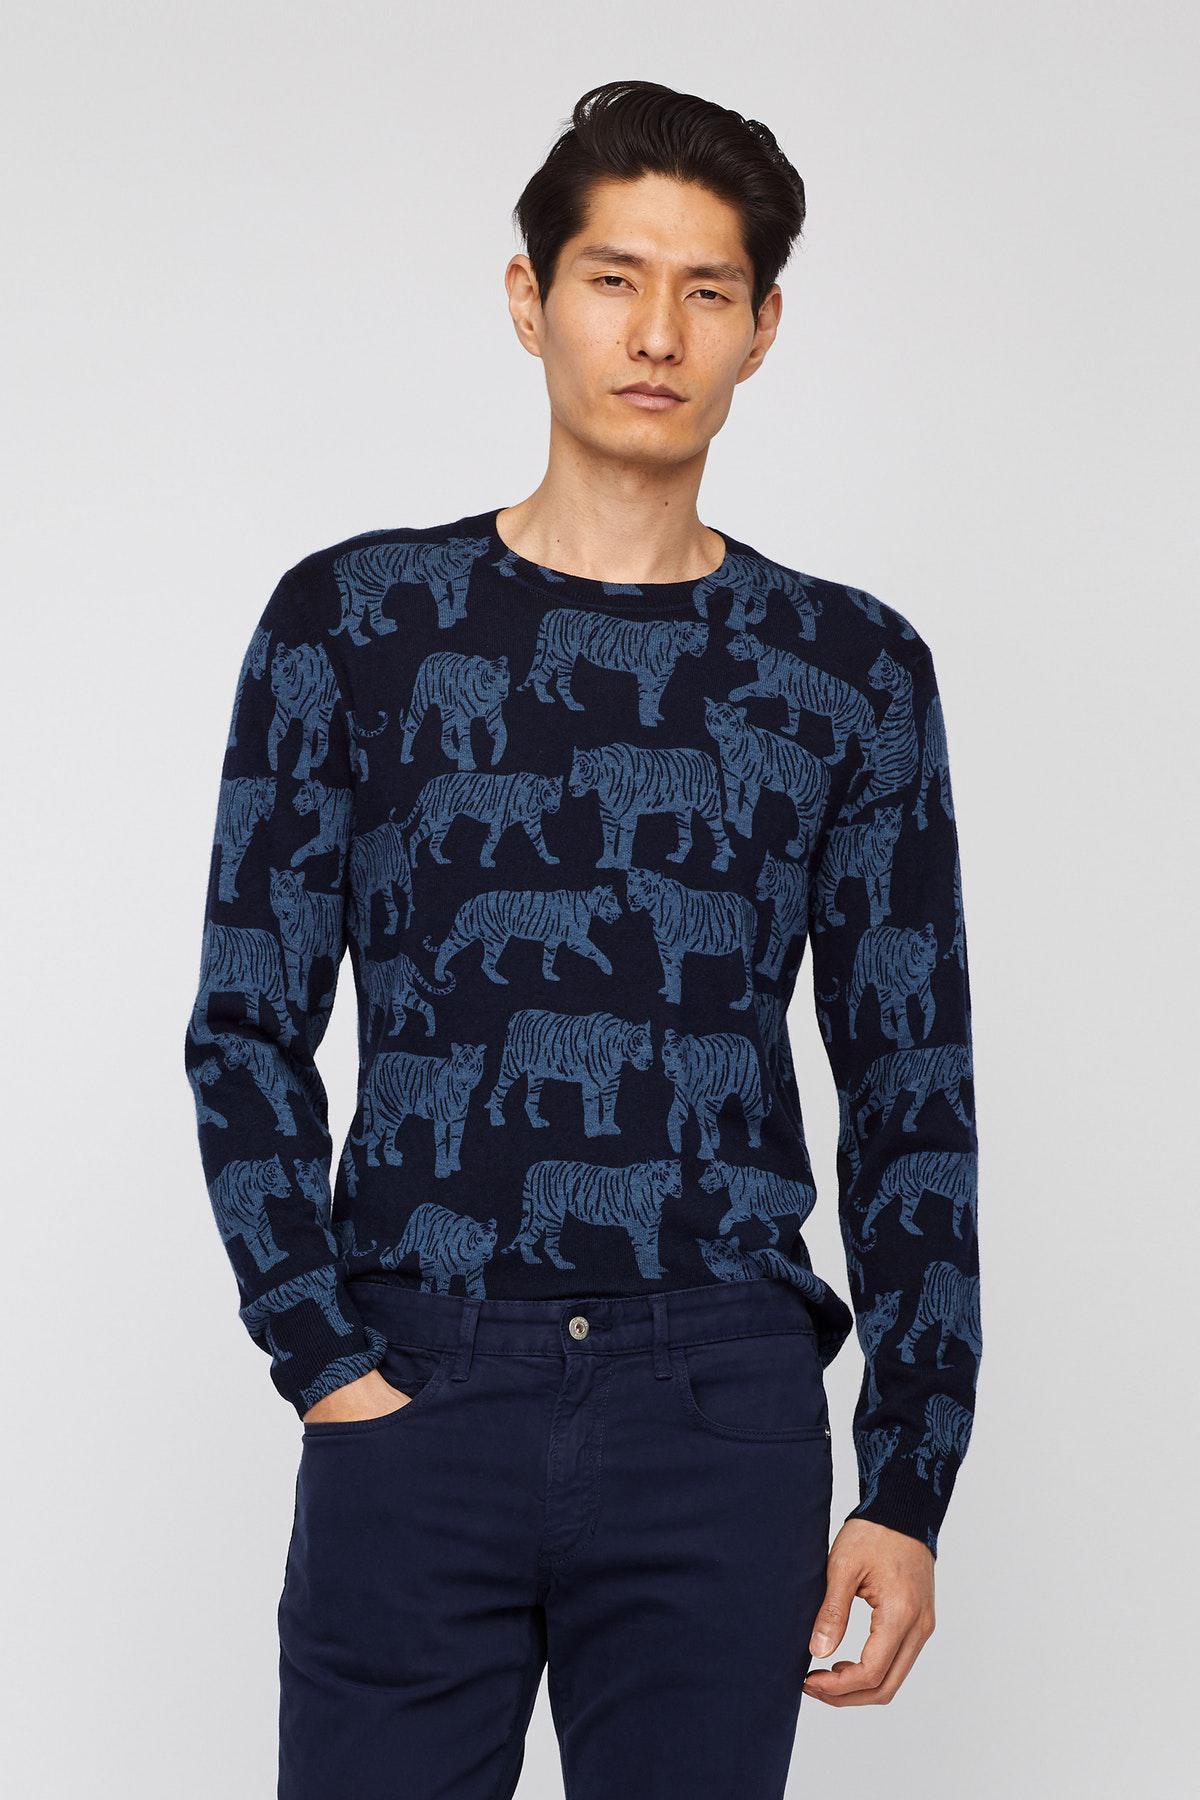 dc0ae5c952ae Lyst - Bonobos Merino Cotton Novelty Sweater in Blue for Men